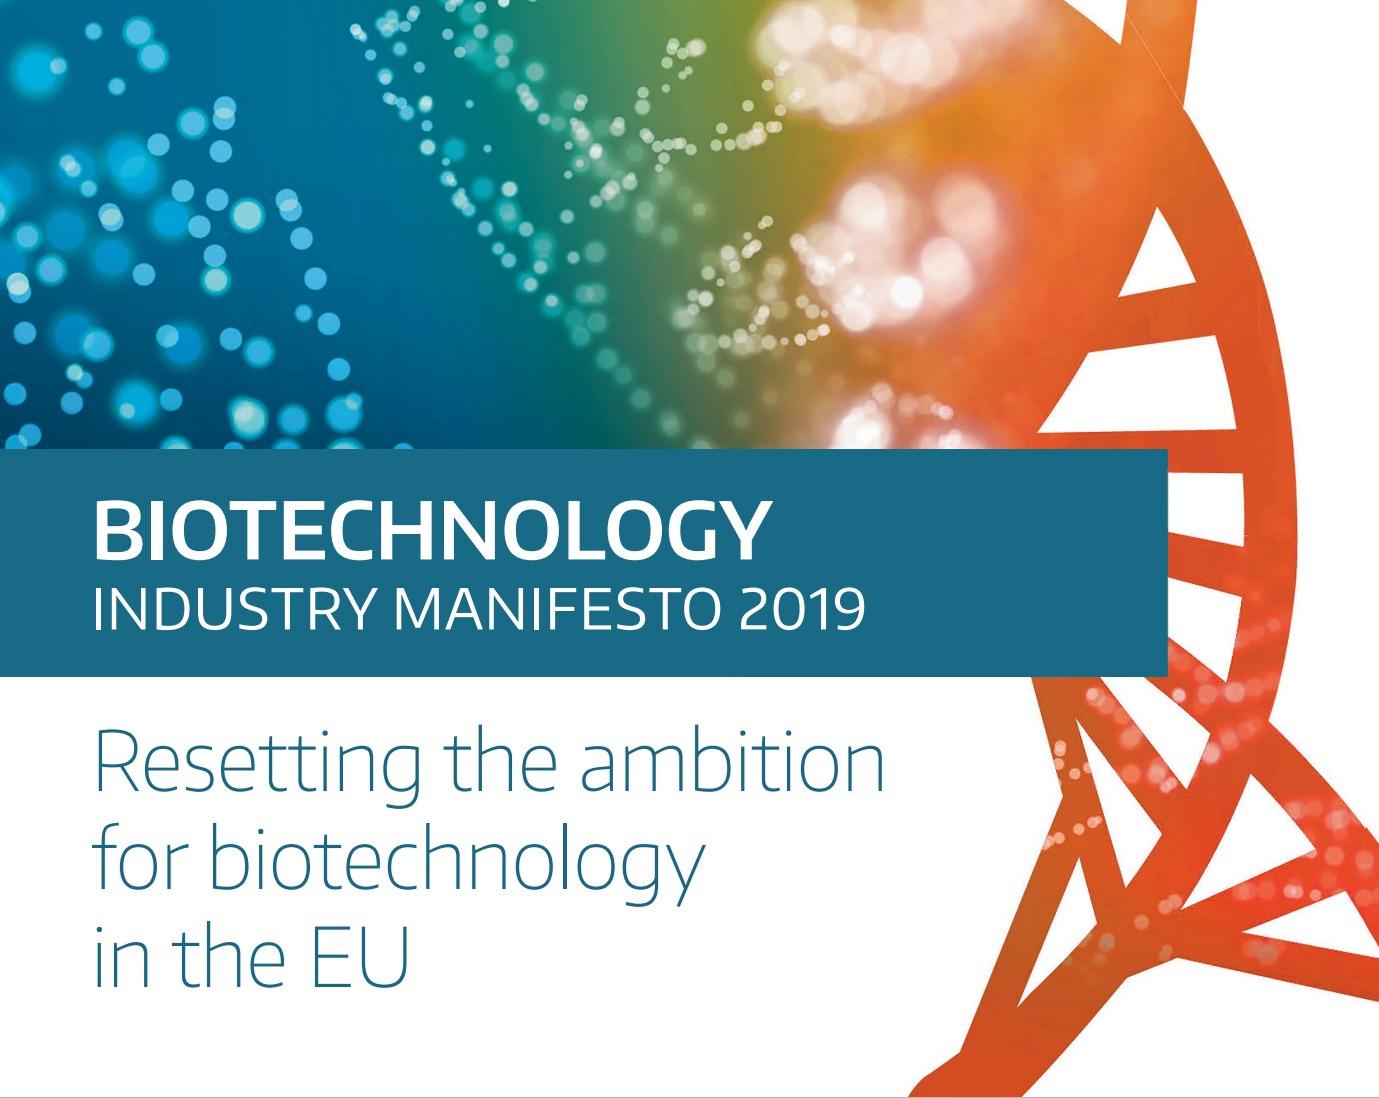 BioTech industry Manifesto 2019